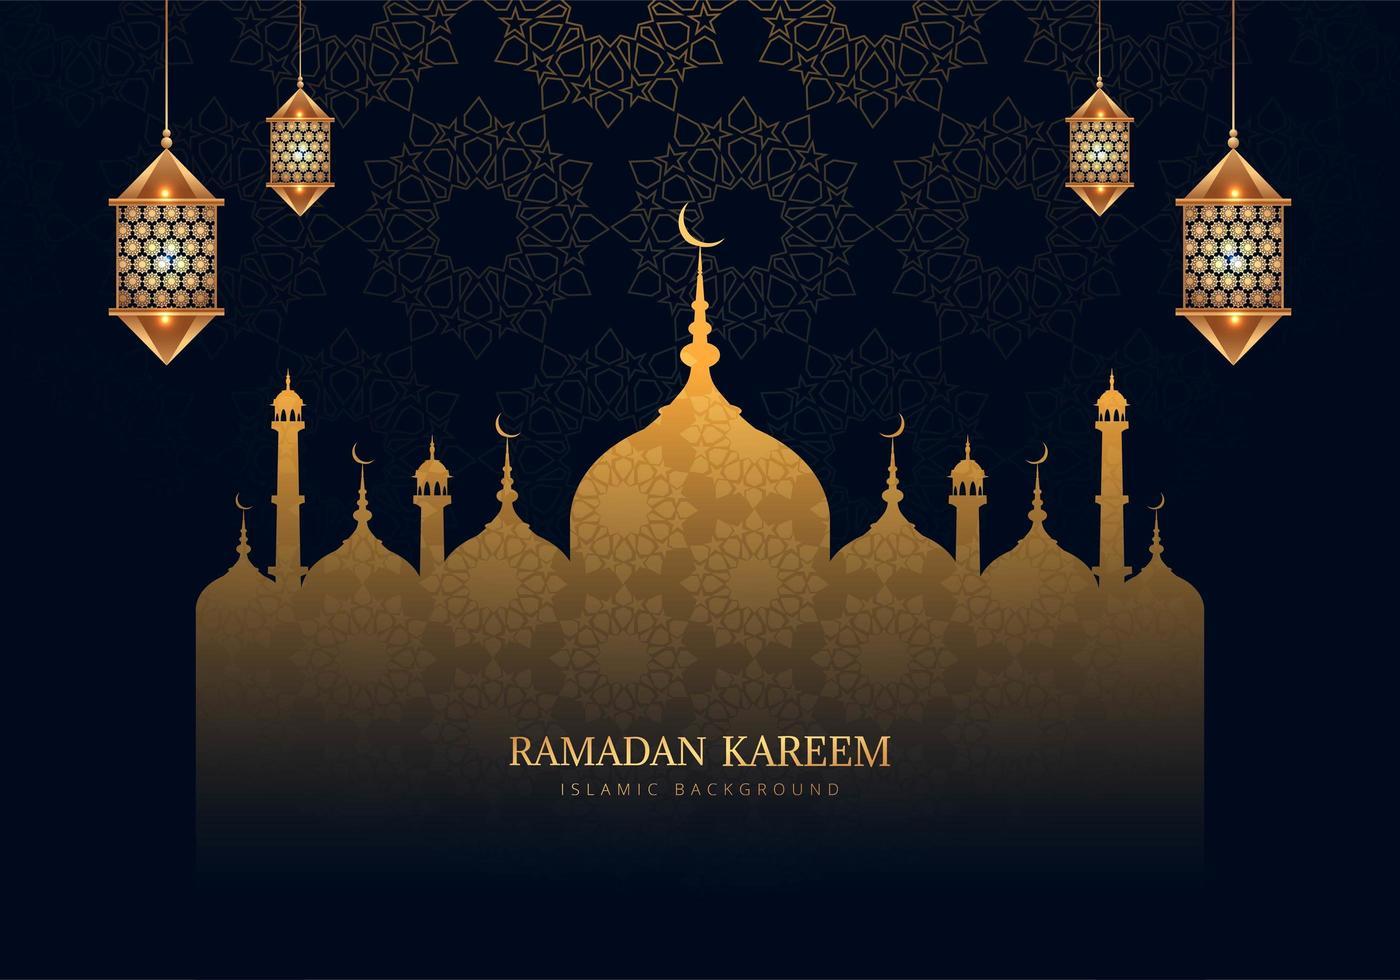 Ramadan Kareem schöne gemusterte Moschee Silhouette vektor